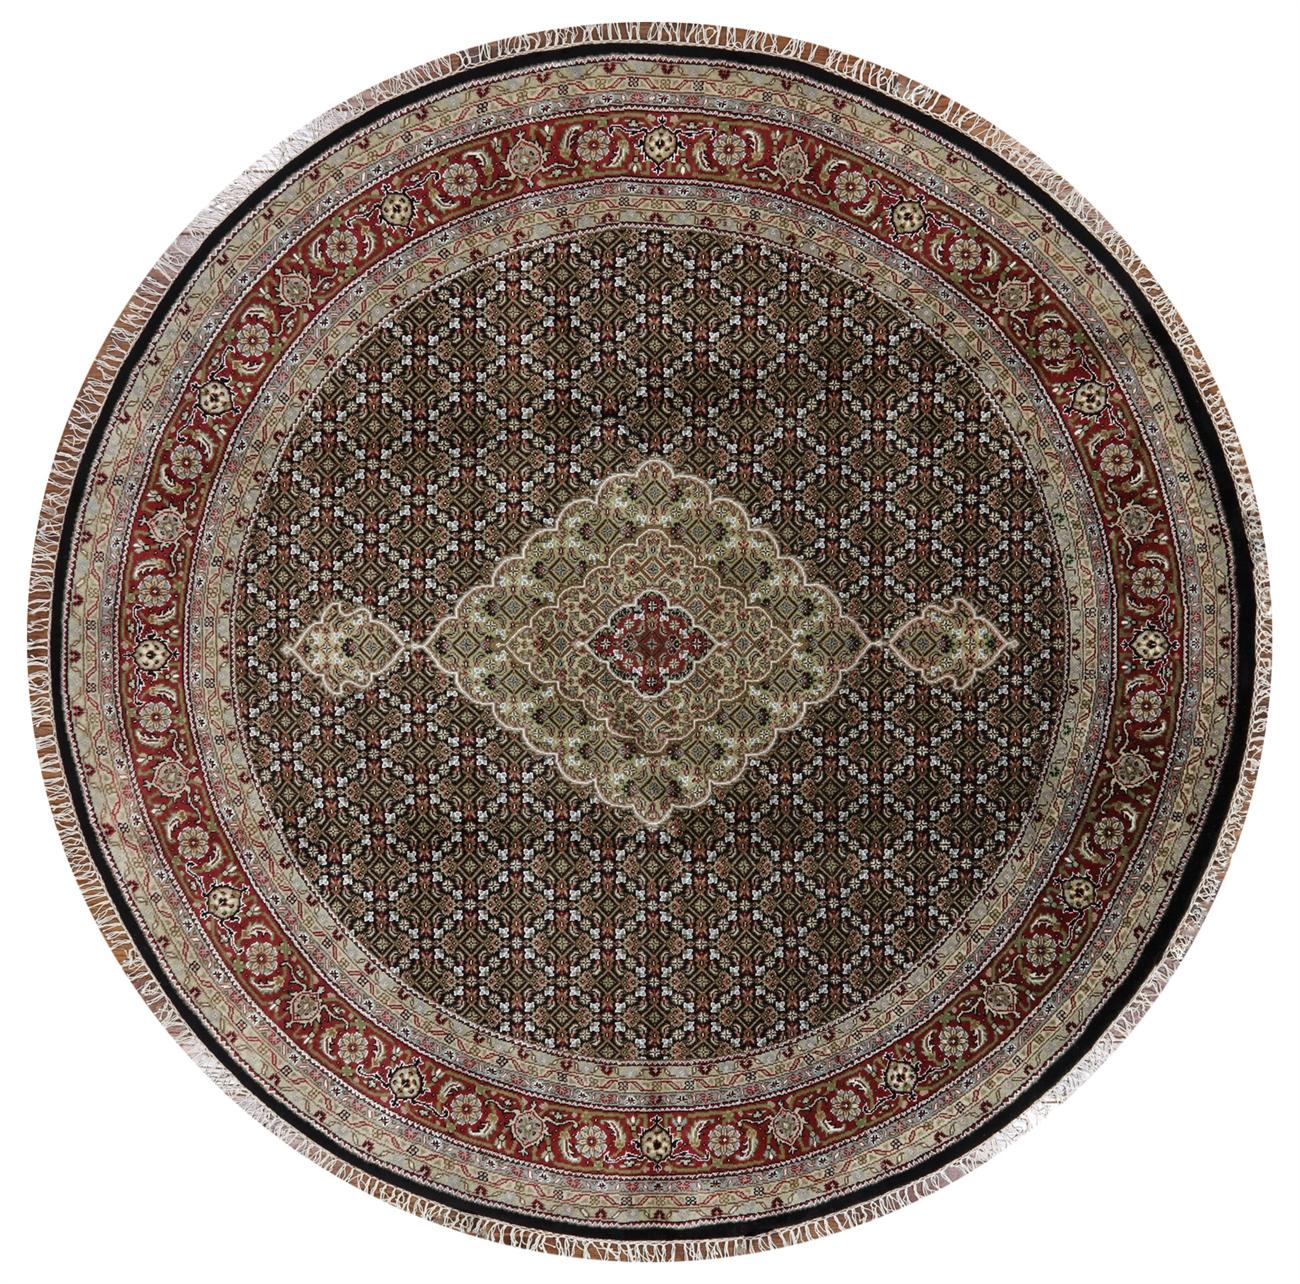 Round Hand Knotted Wool & Silk Black Tabriz Rug - 8' Round Hand Knotted Oriental Wool & Silk Black Tabriz Rug W1095